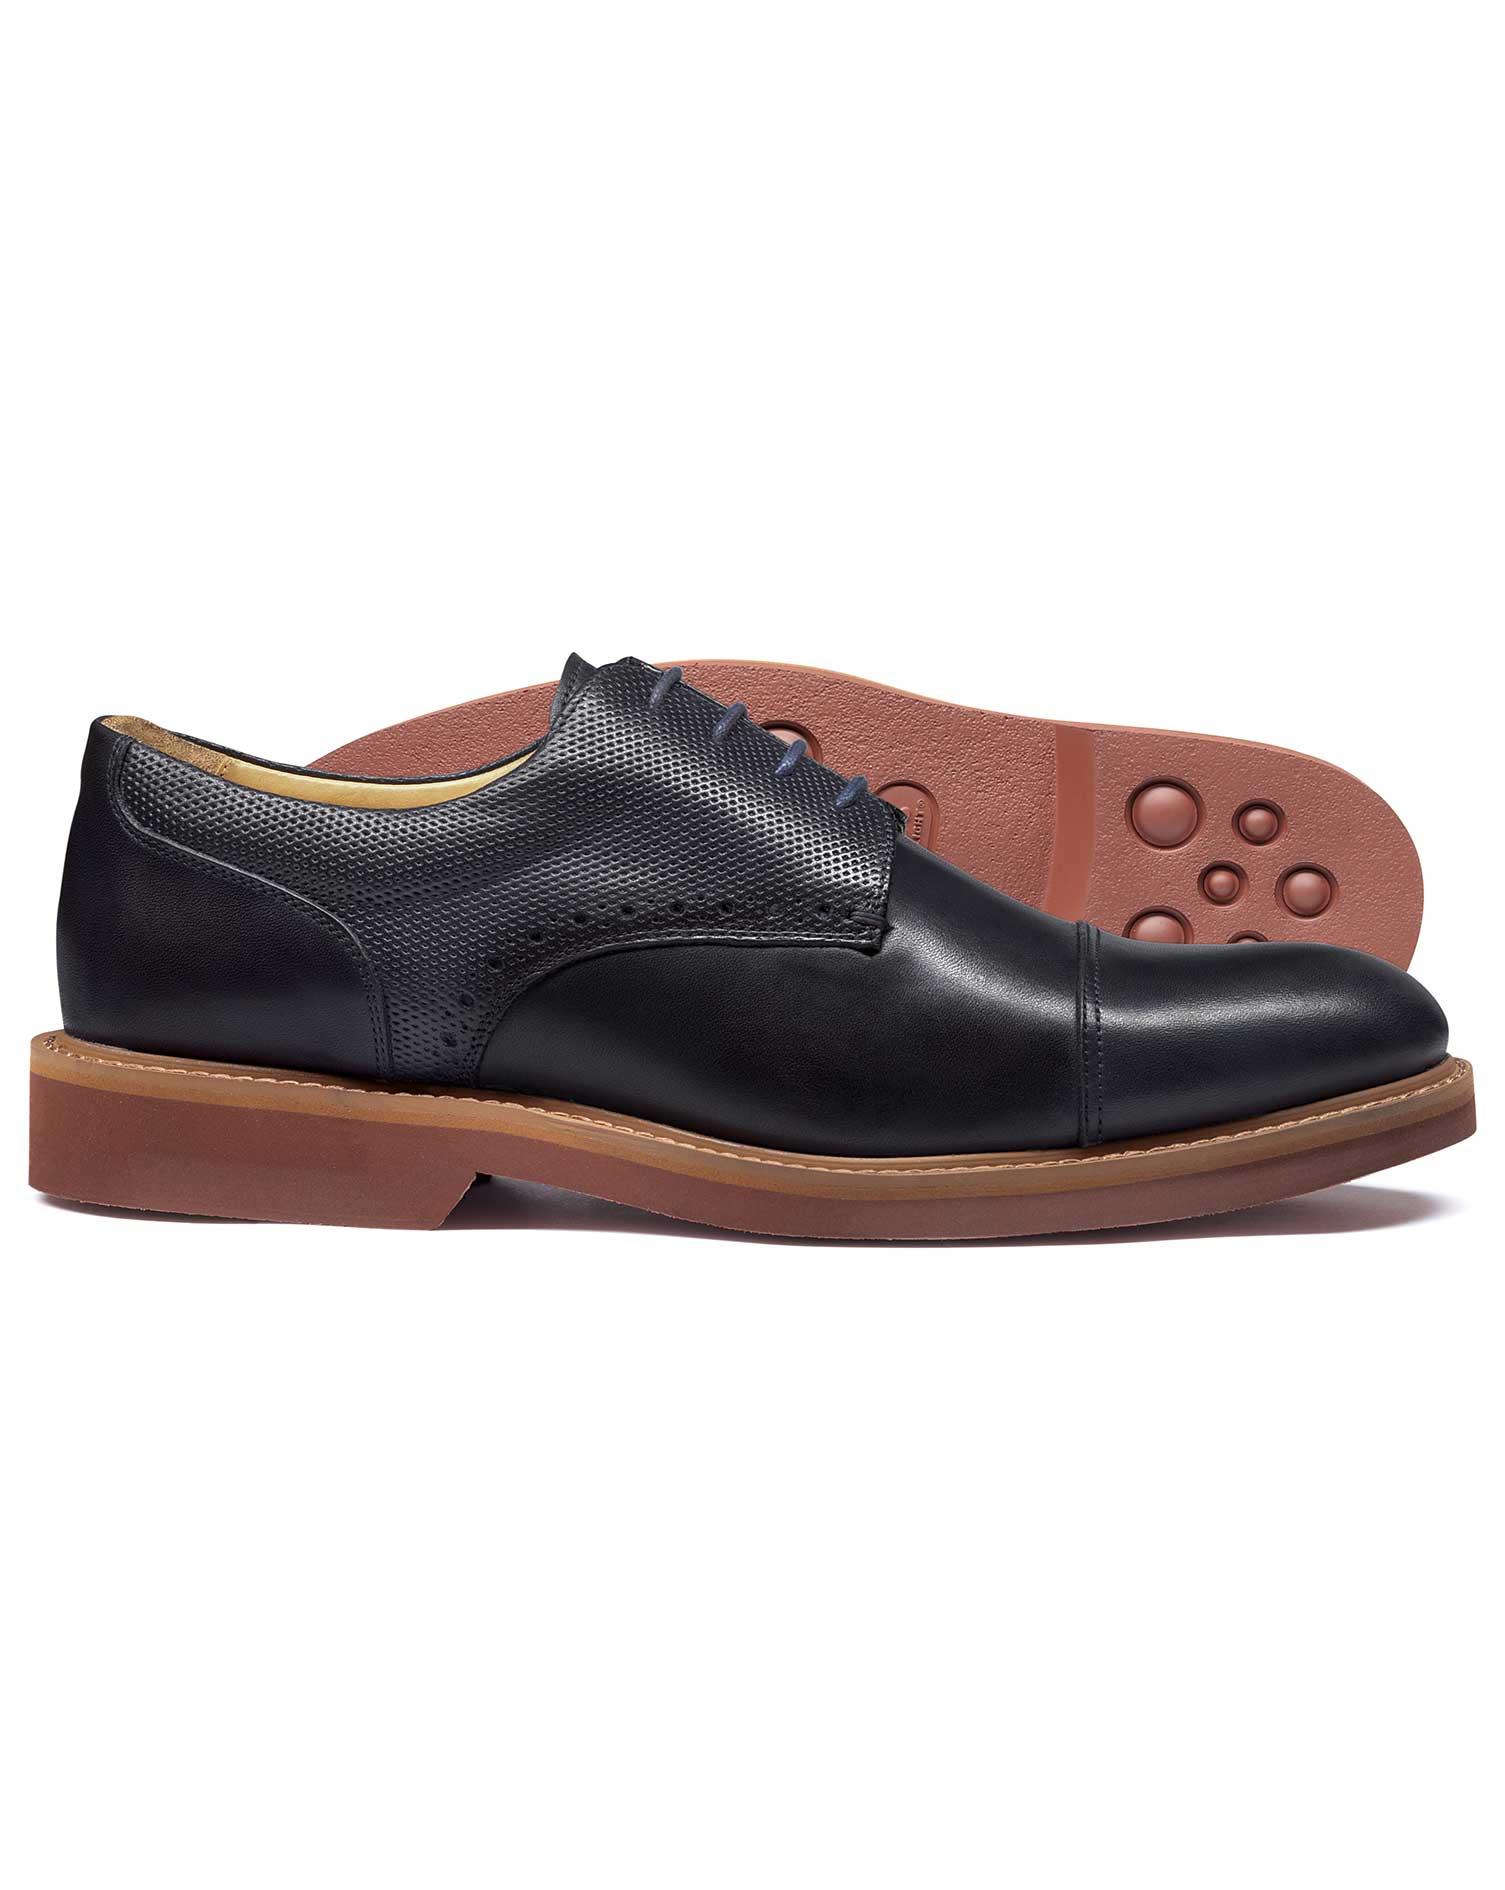 Navy Extra Lightweight Derby Shoe Size 7 R by Charles Tyrwhitt